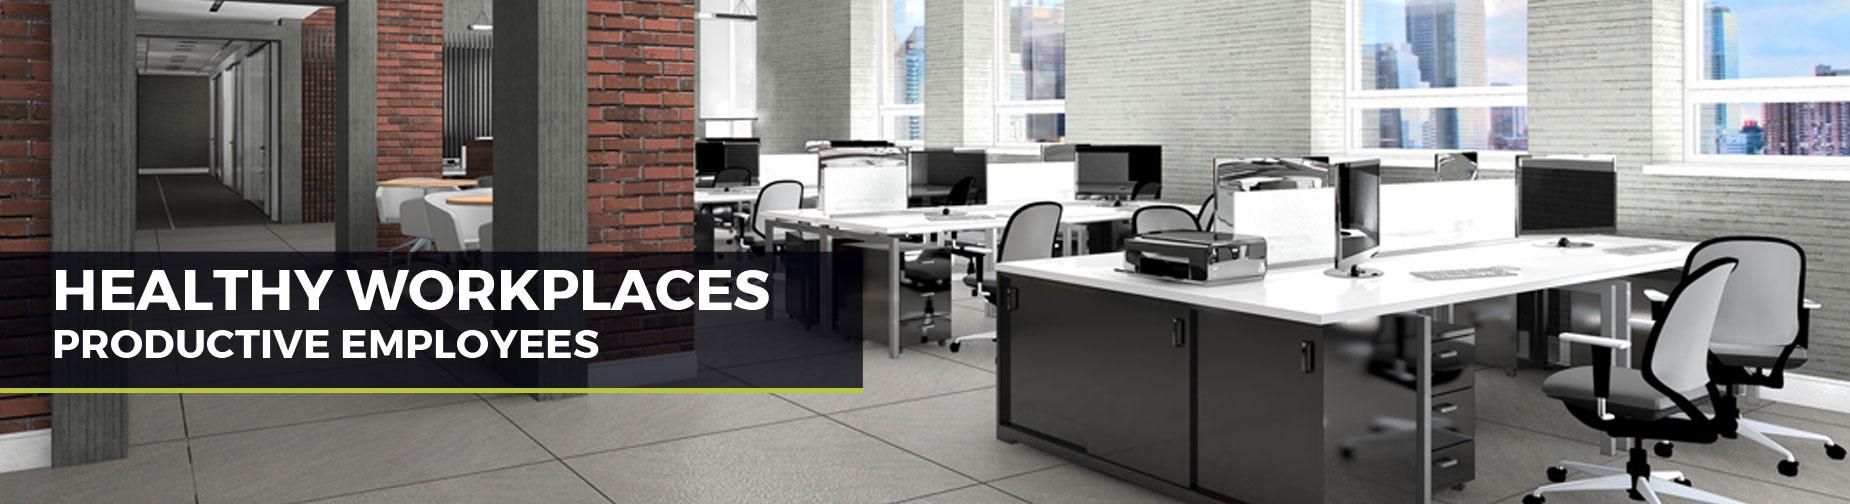 San Diego ergonomic consulting services